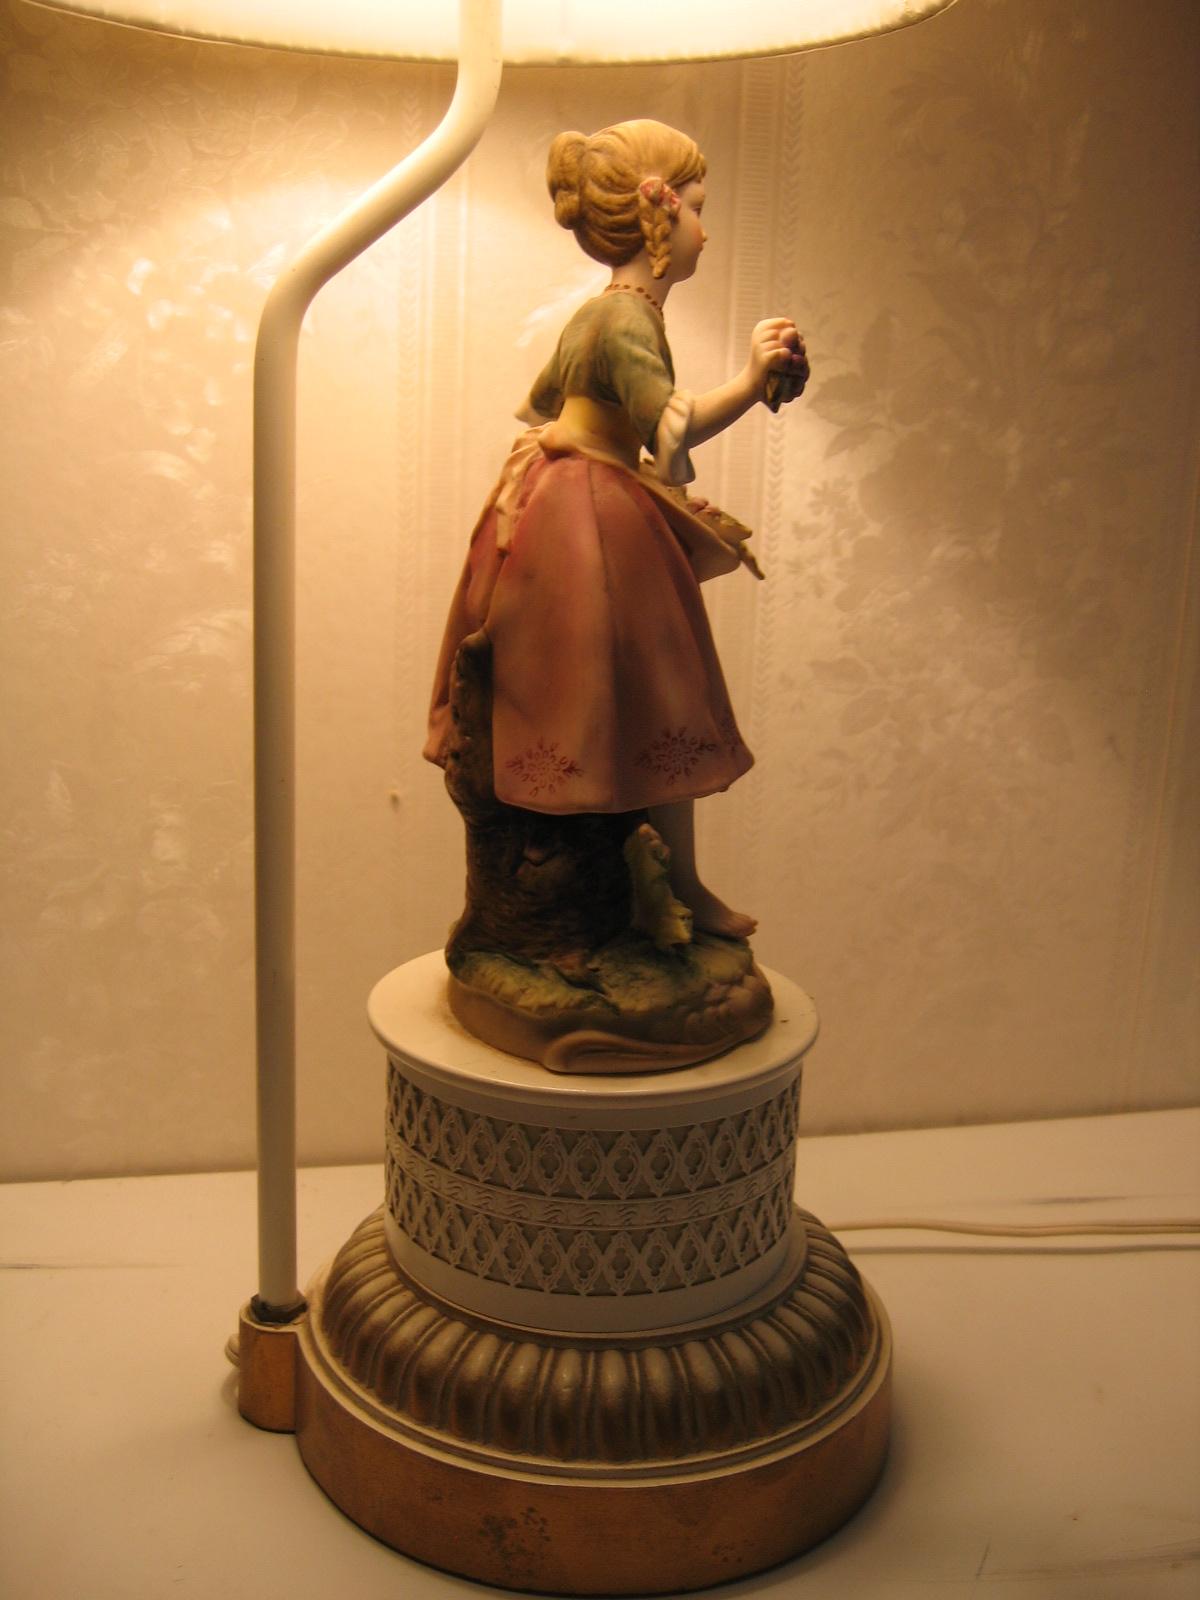 Vintage Victorian Lady Porcelain Figurine Entry Table